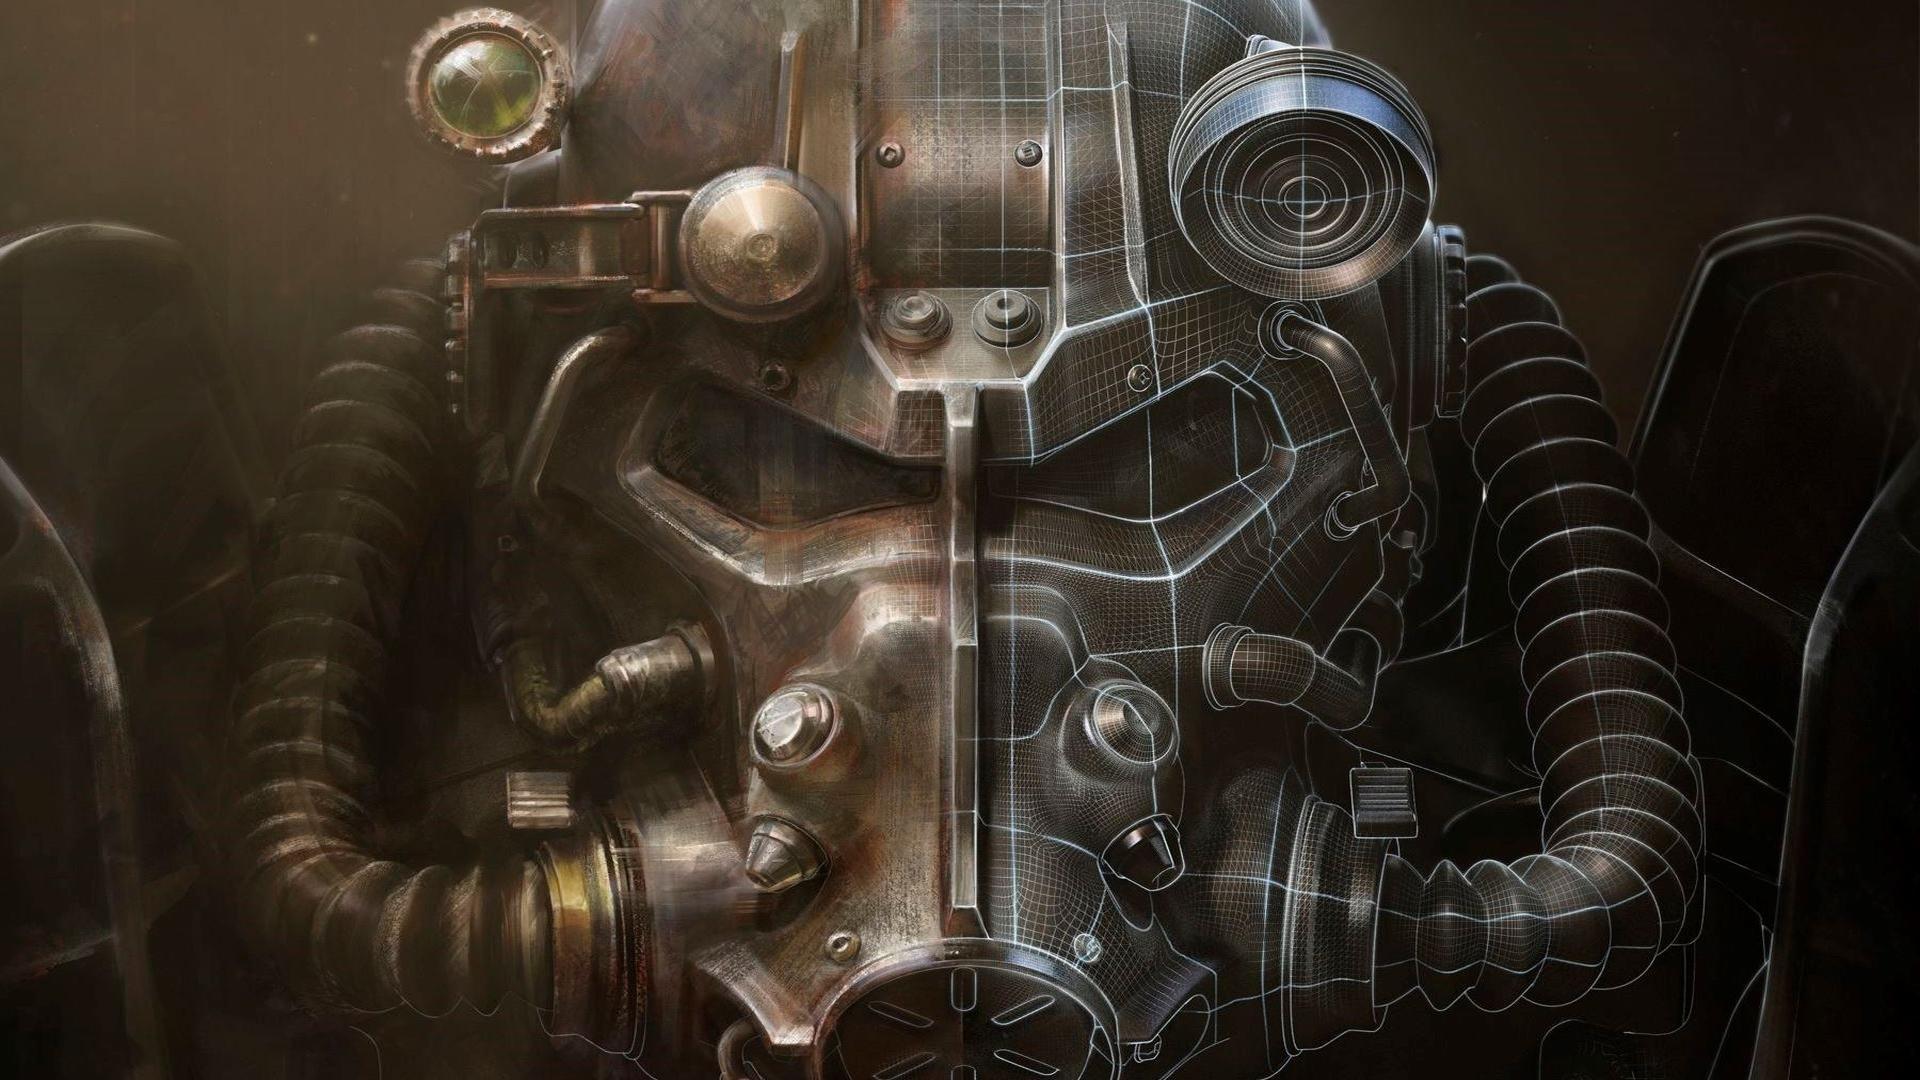 Шлем силовой брони - Fallout 4 арт, шлем силовой брони